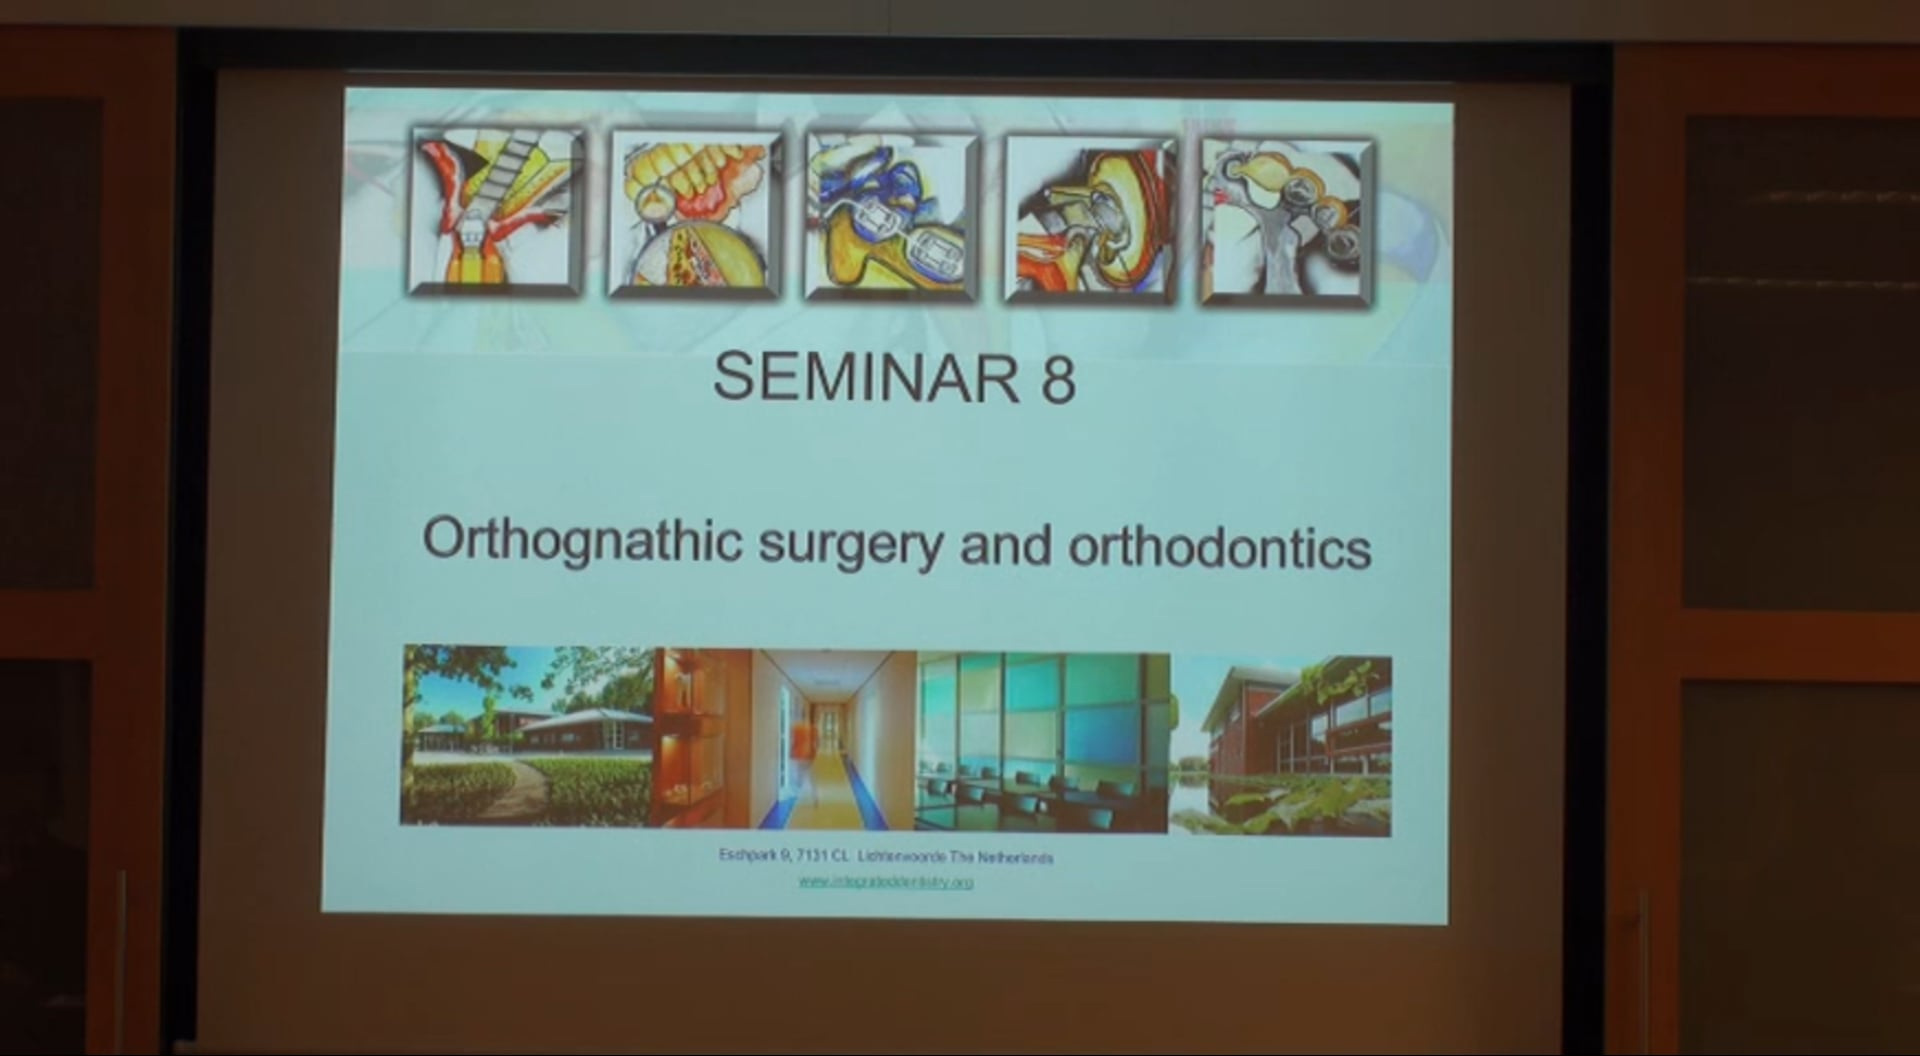 Seminar 8 2017 Handout 38-45 - Vimeo thumbnail